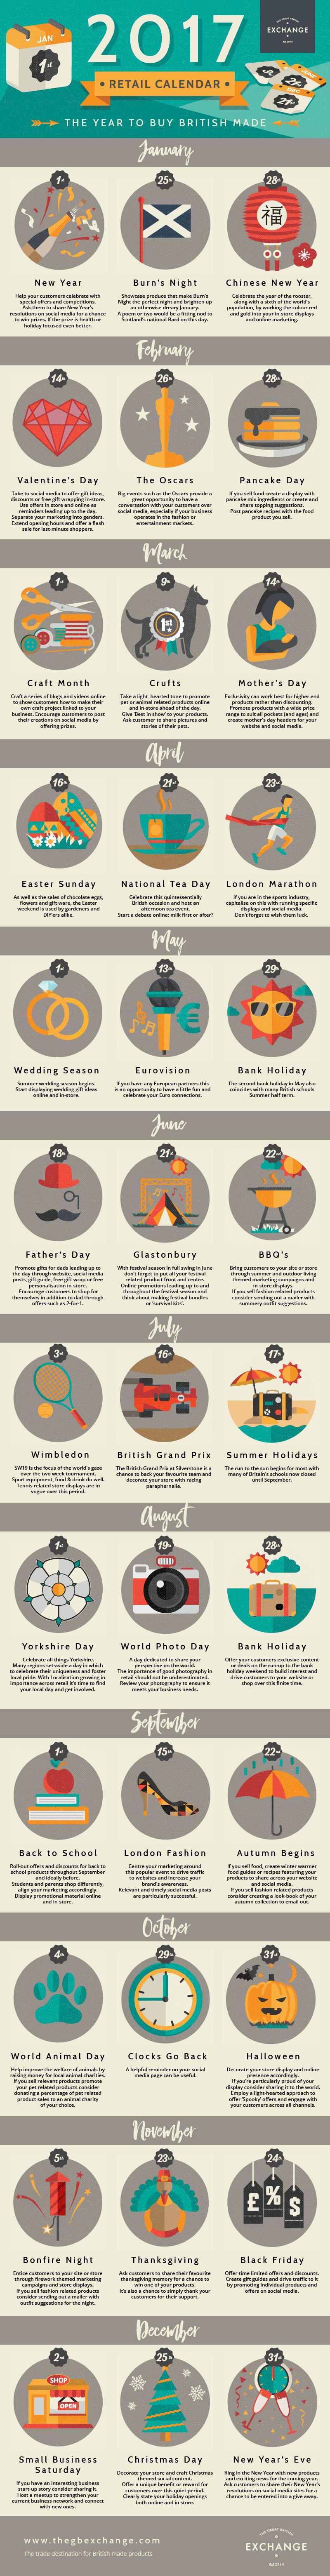 infographic, digital marketing, business, B2B, retail